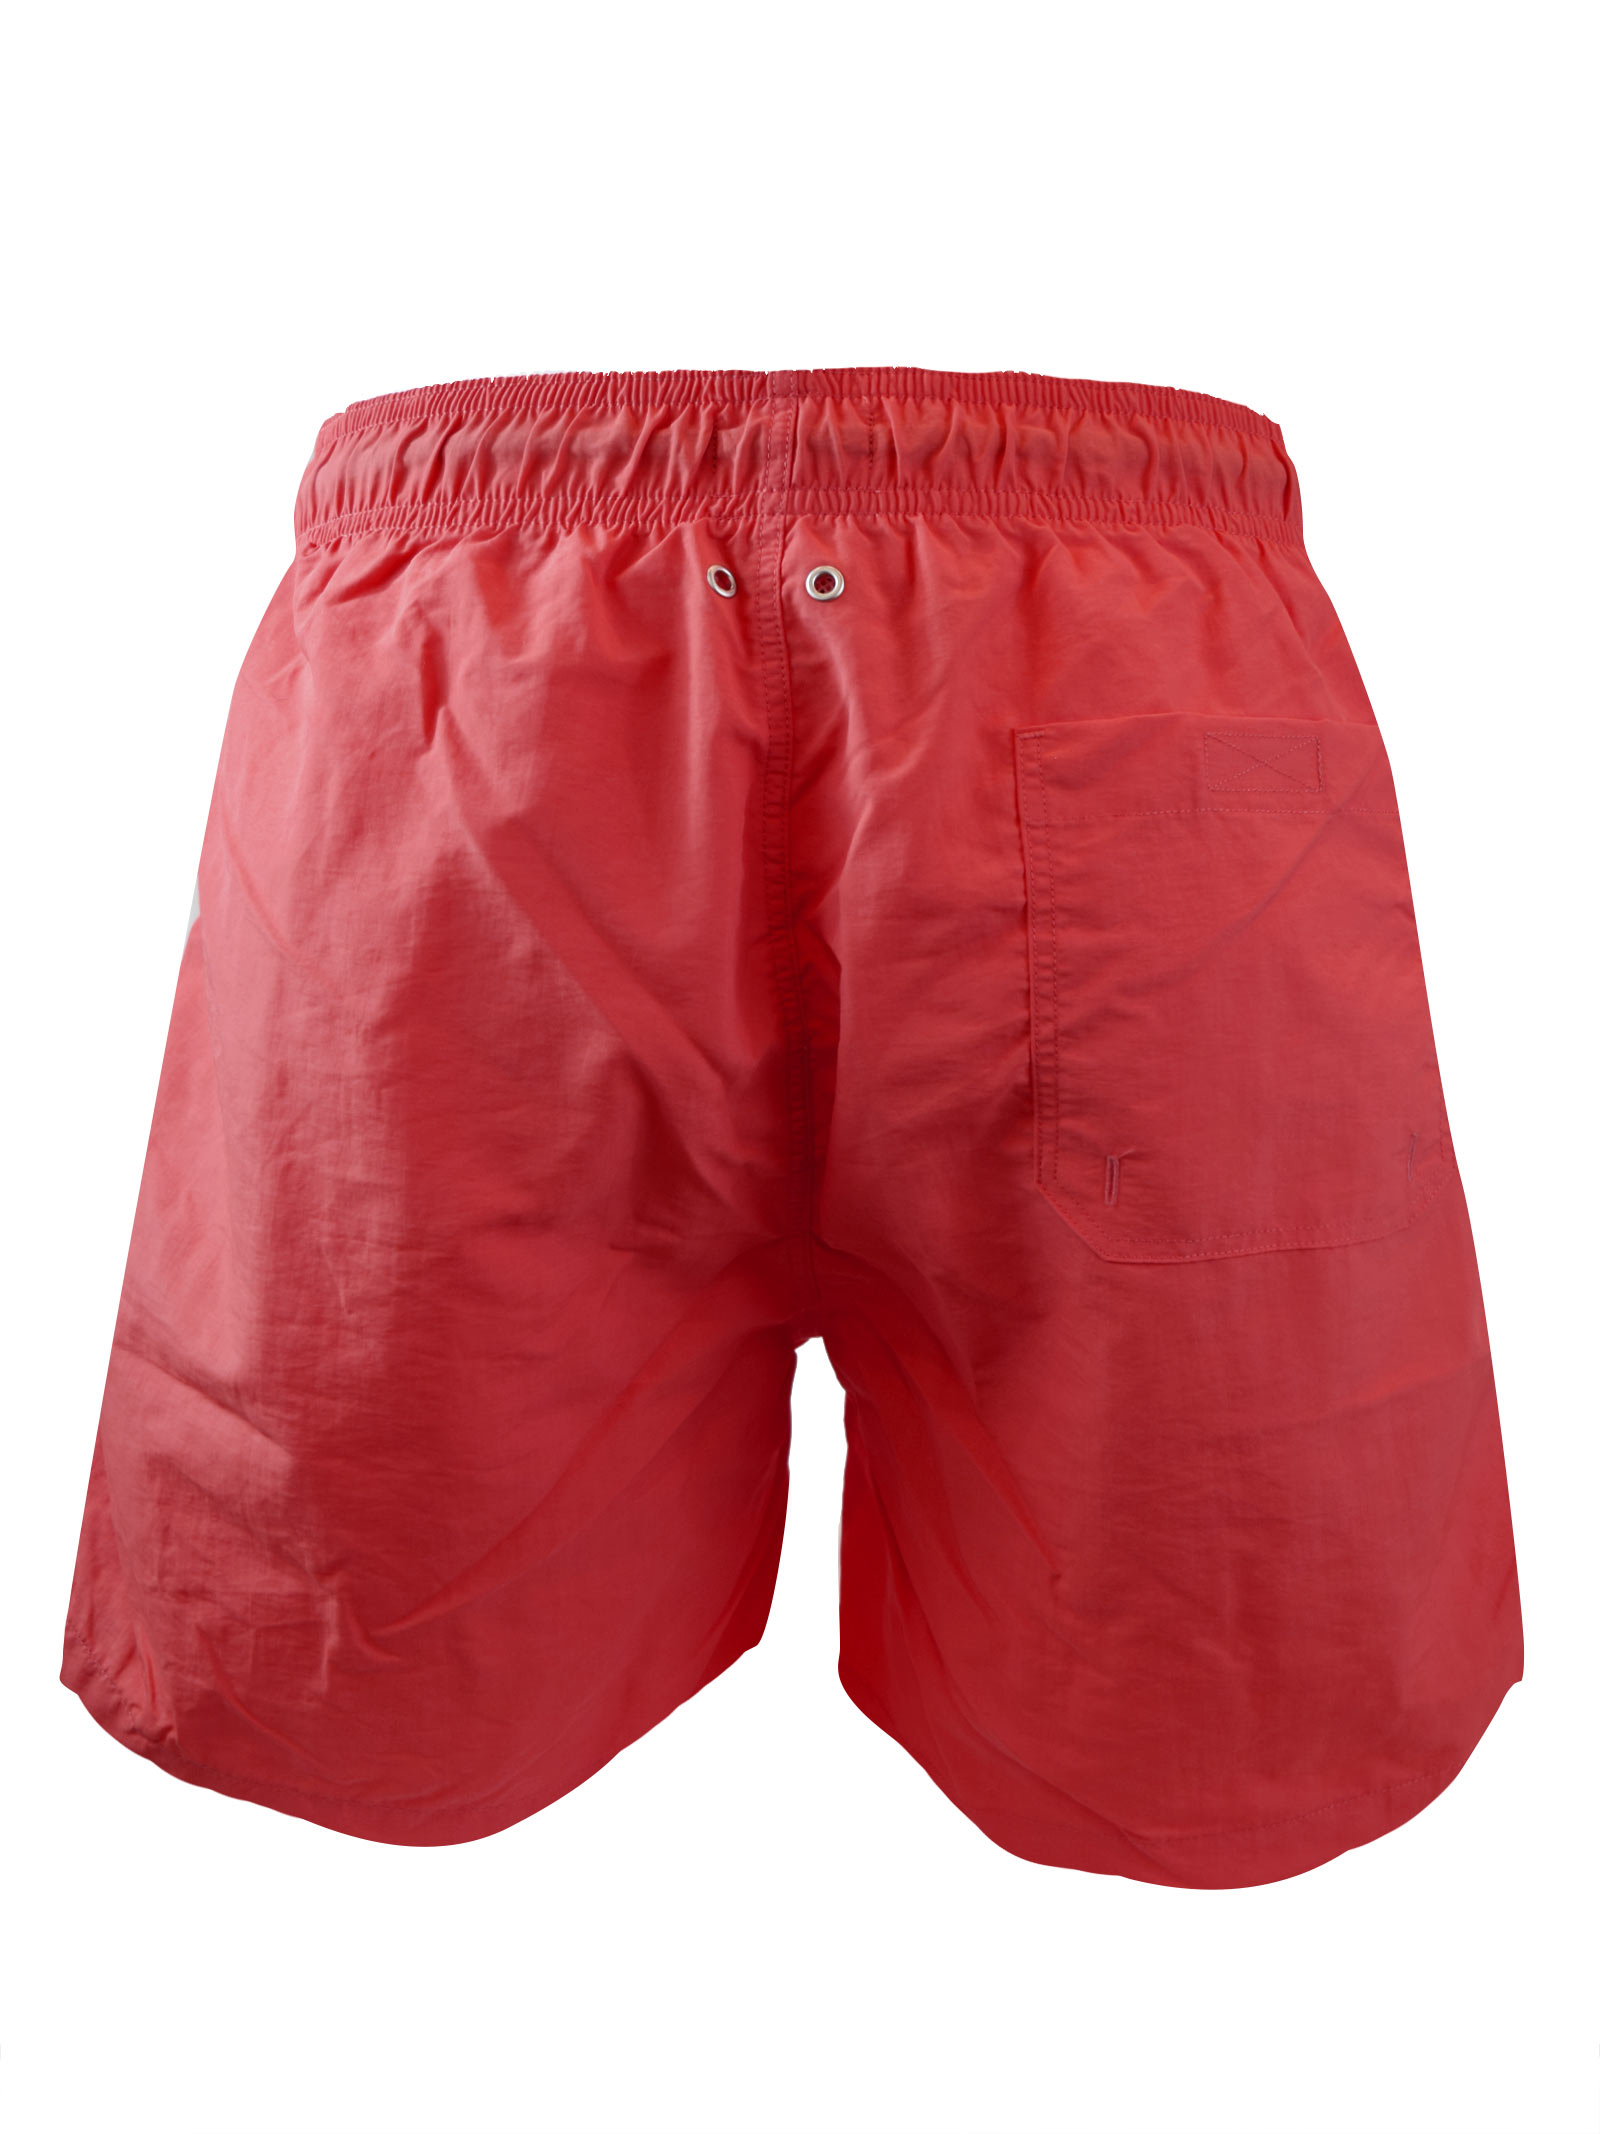 solid color swim trunk  GANT |  | 922016001620